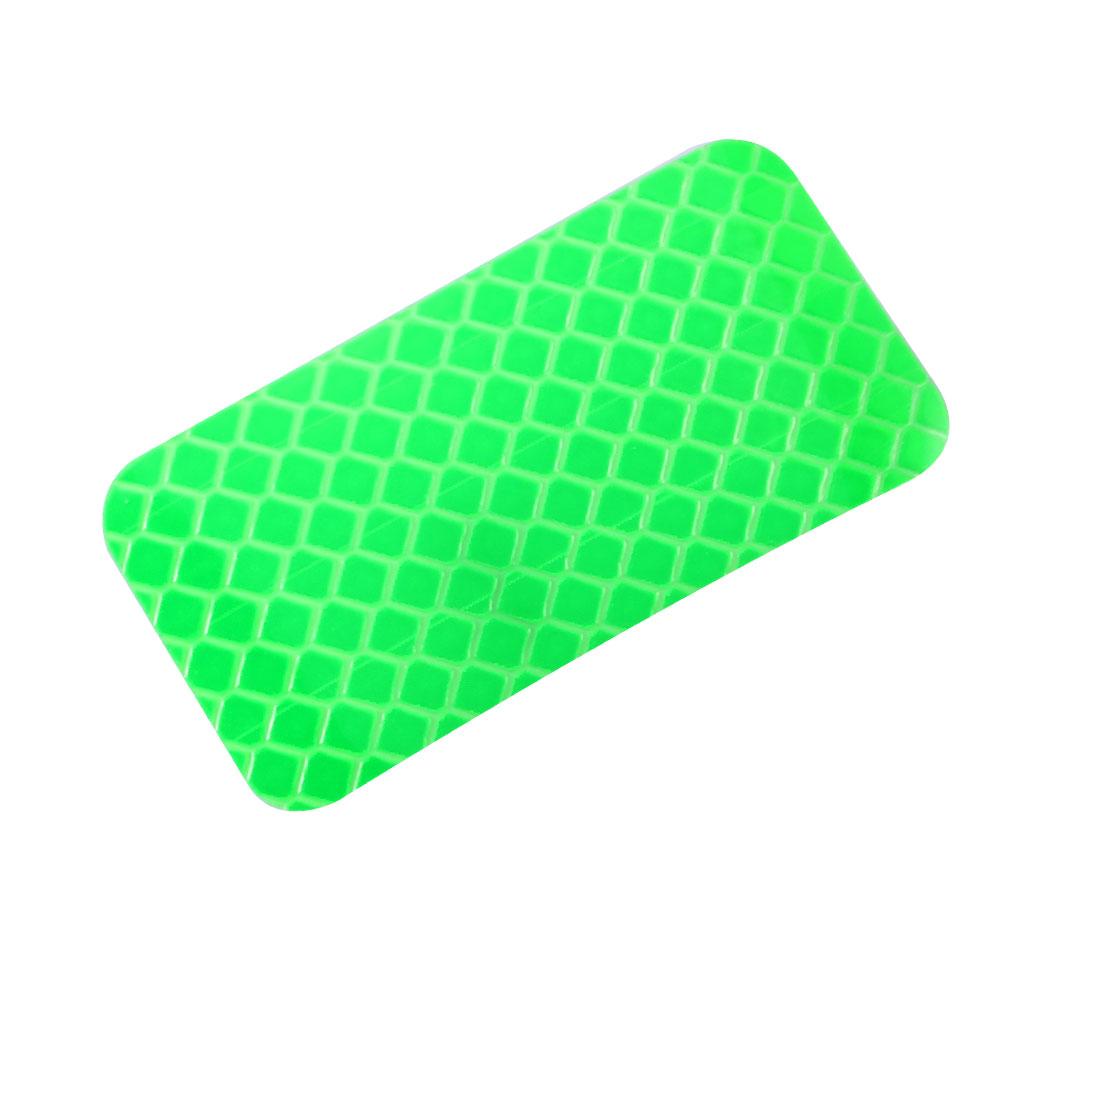 Honeycomb Reflective Warning Tape Film Sticker Green 30mm x 60mm